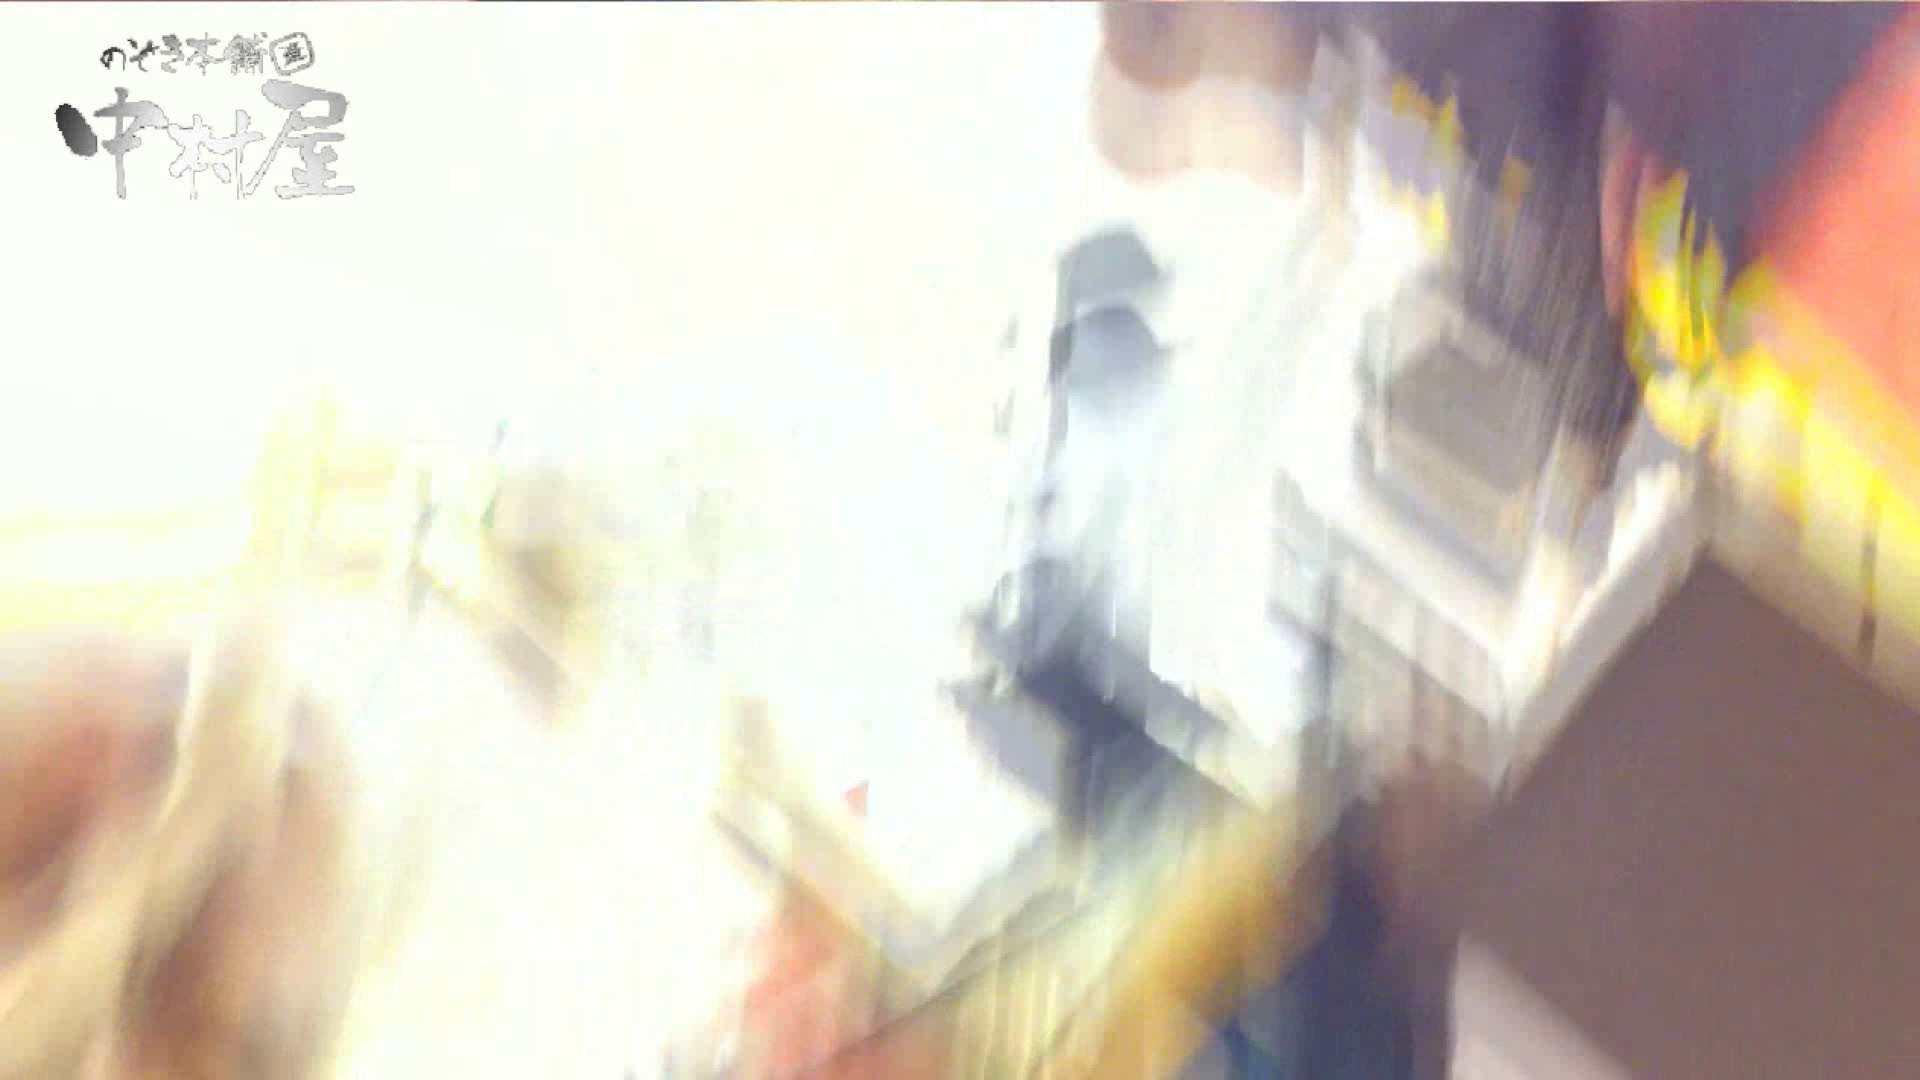 vol.65 美人アパレル胸チラ&パンチラ ムッチリ感がいい感じ花がらパンツさん チラ  106連発 27